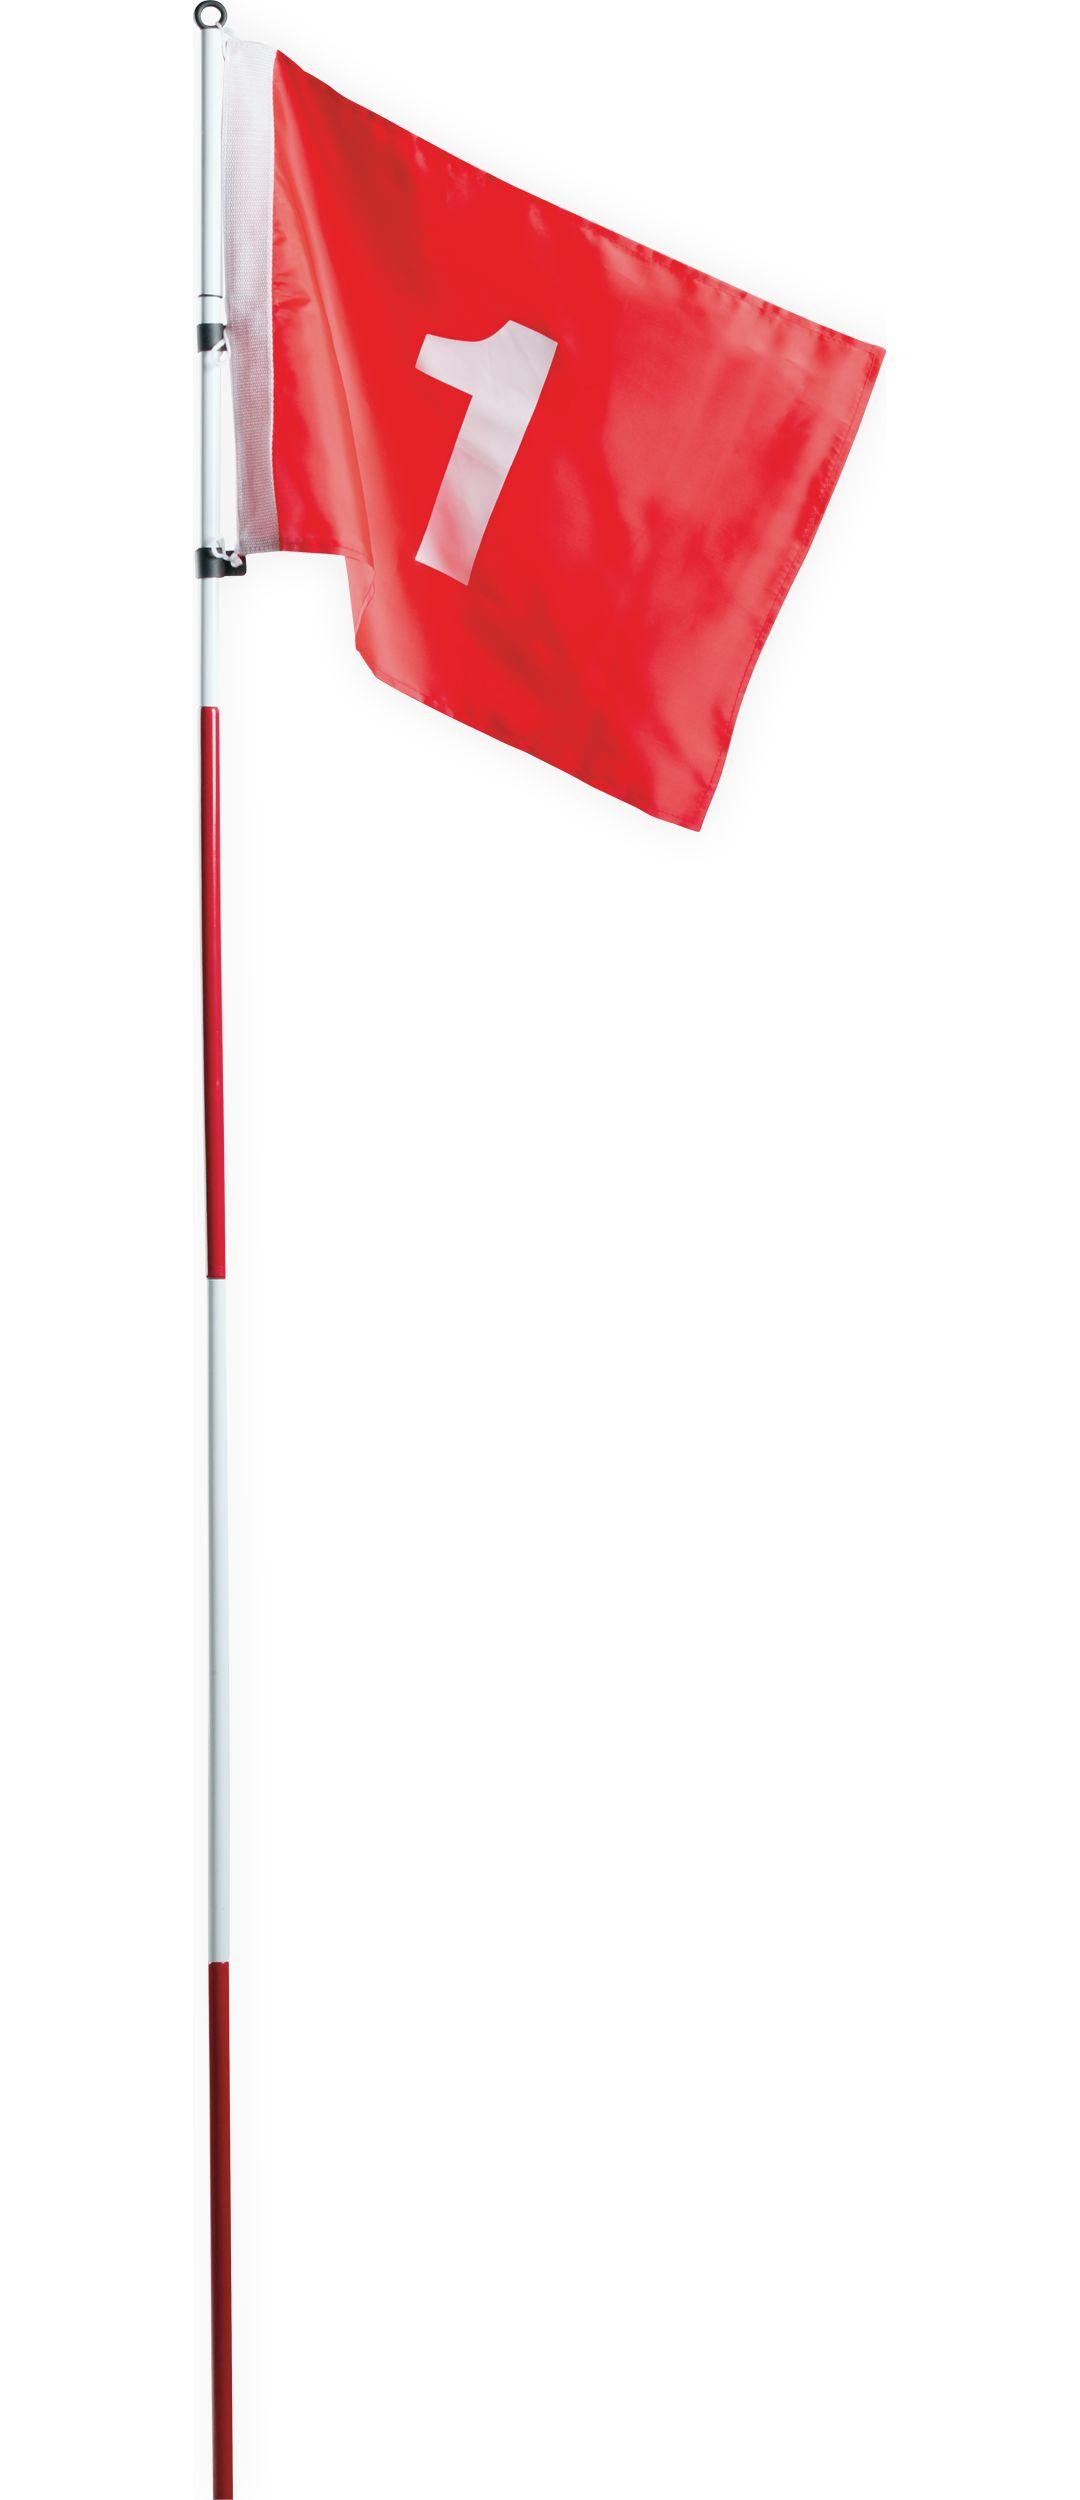 Maxfli Flag Pole with Cup